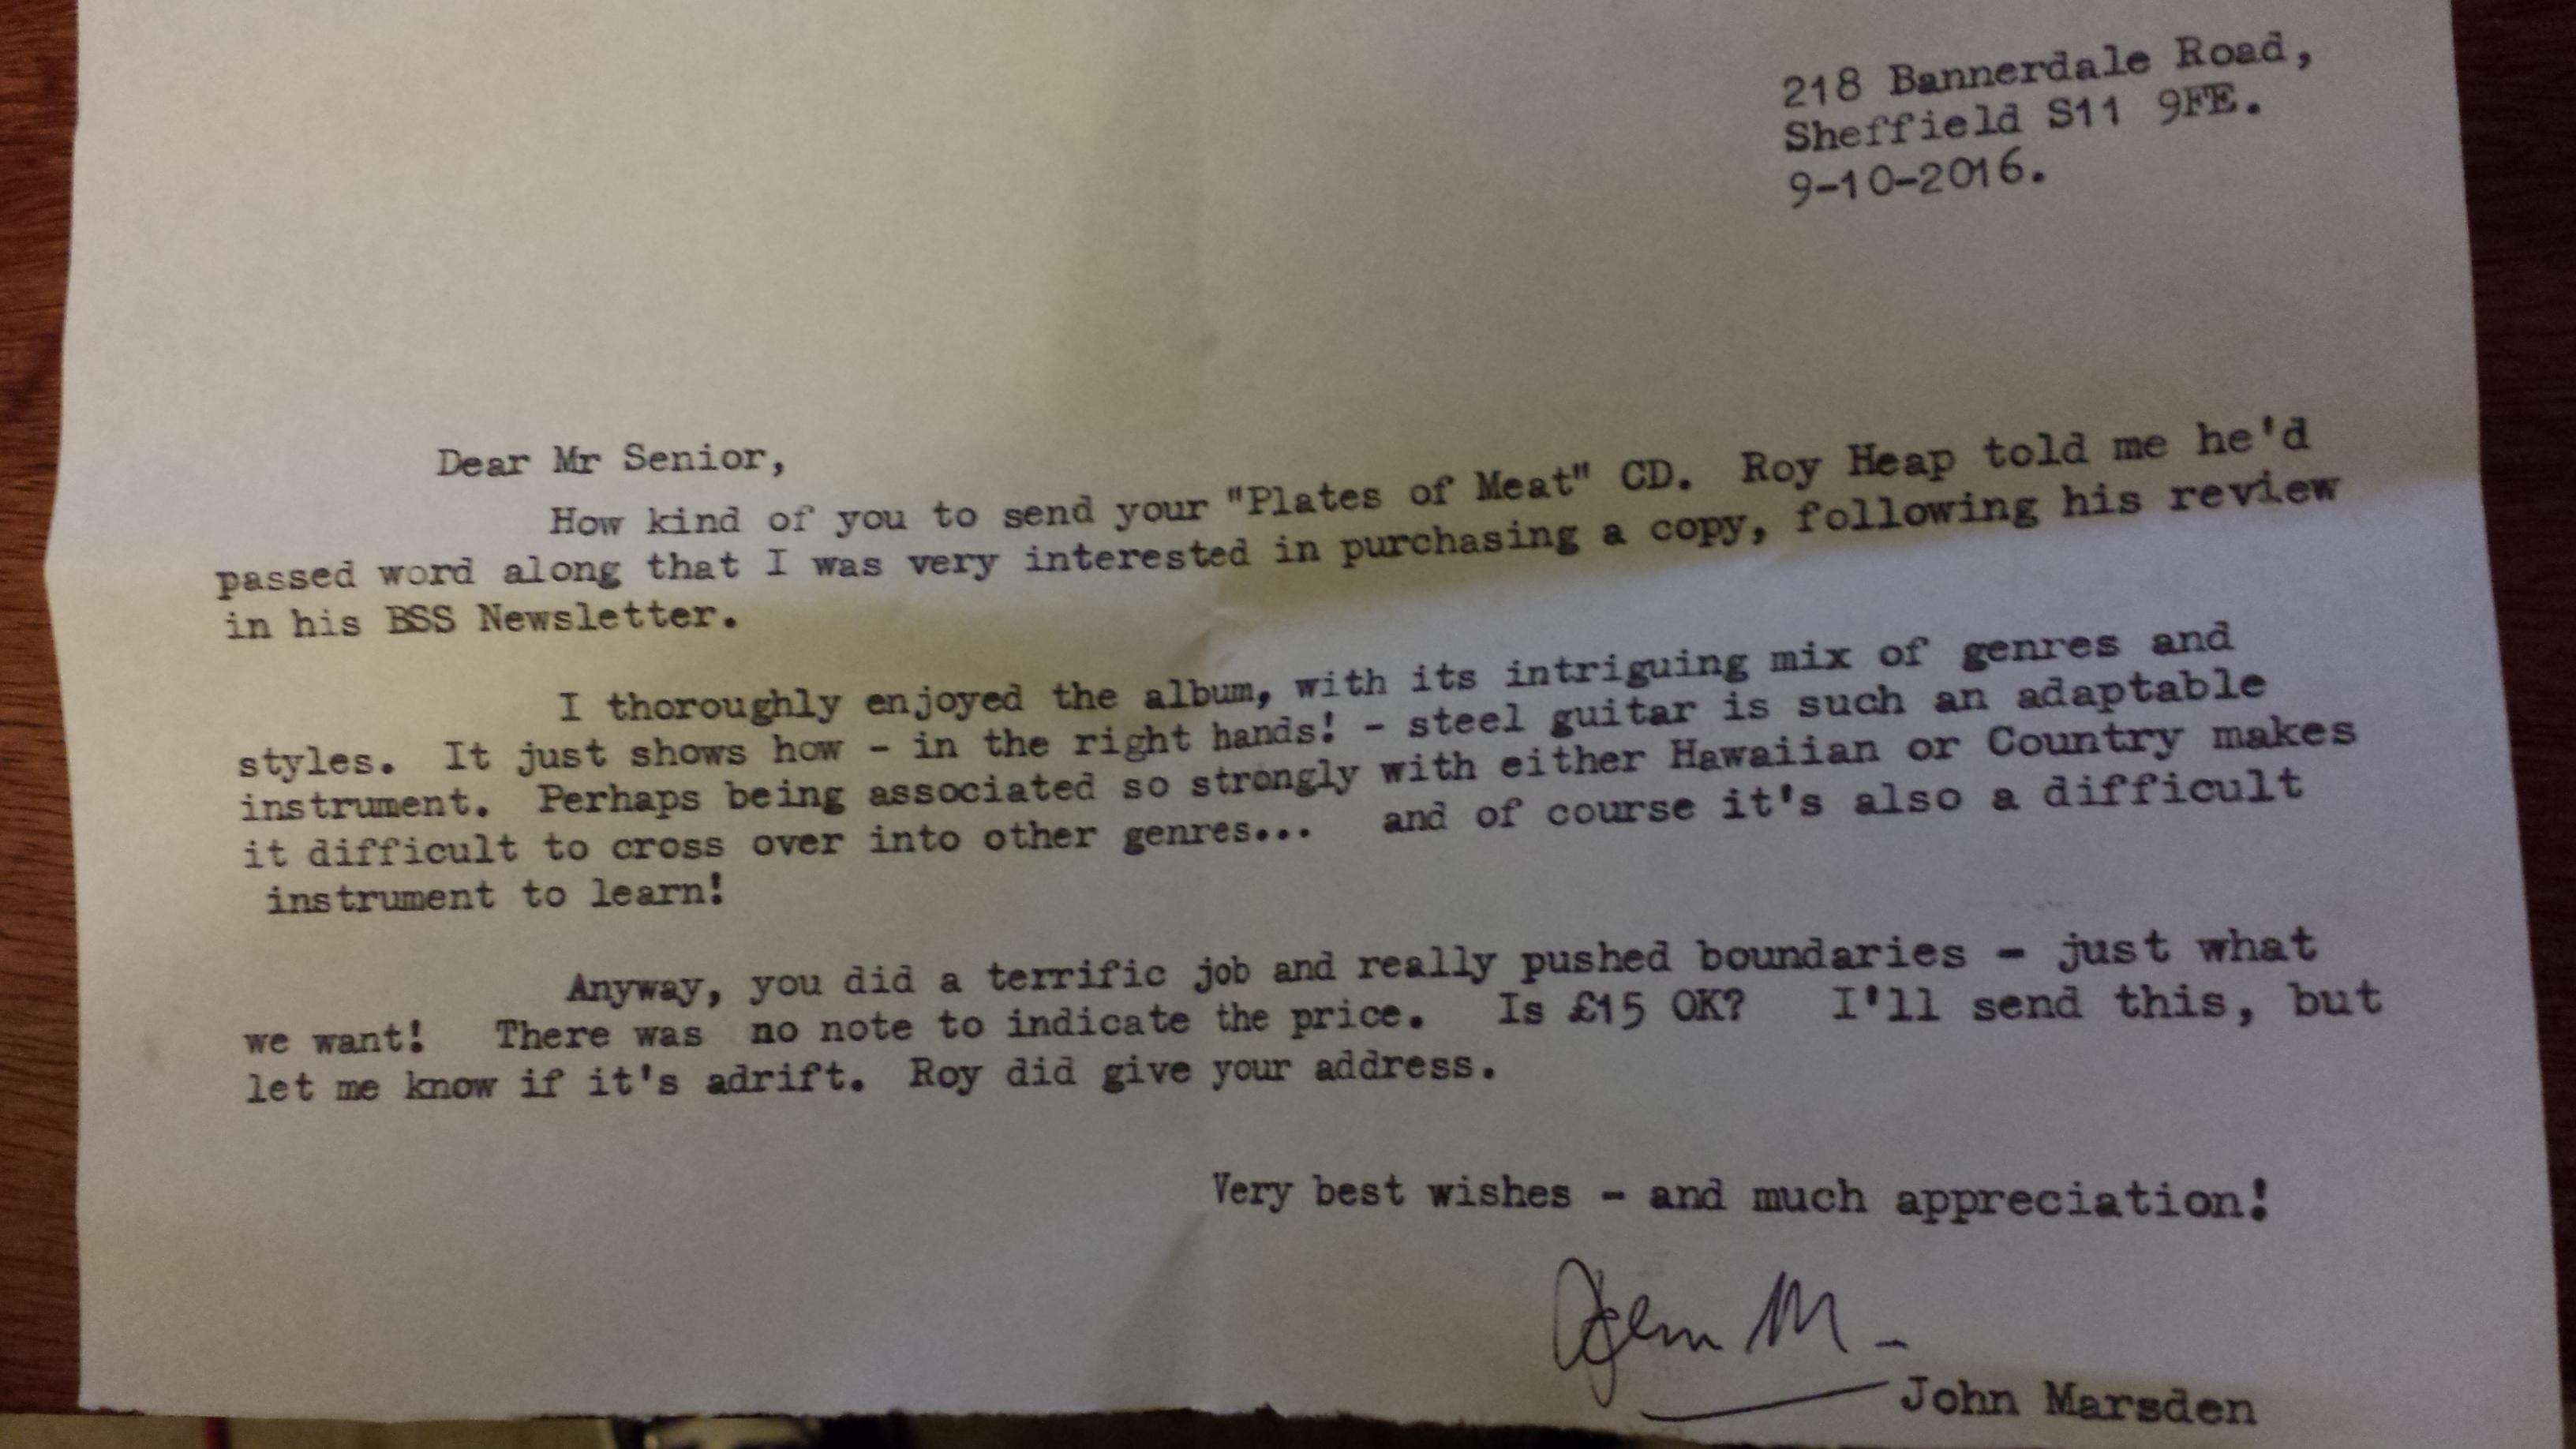 John Marsden's Response to Plates of Meat